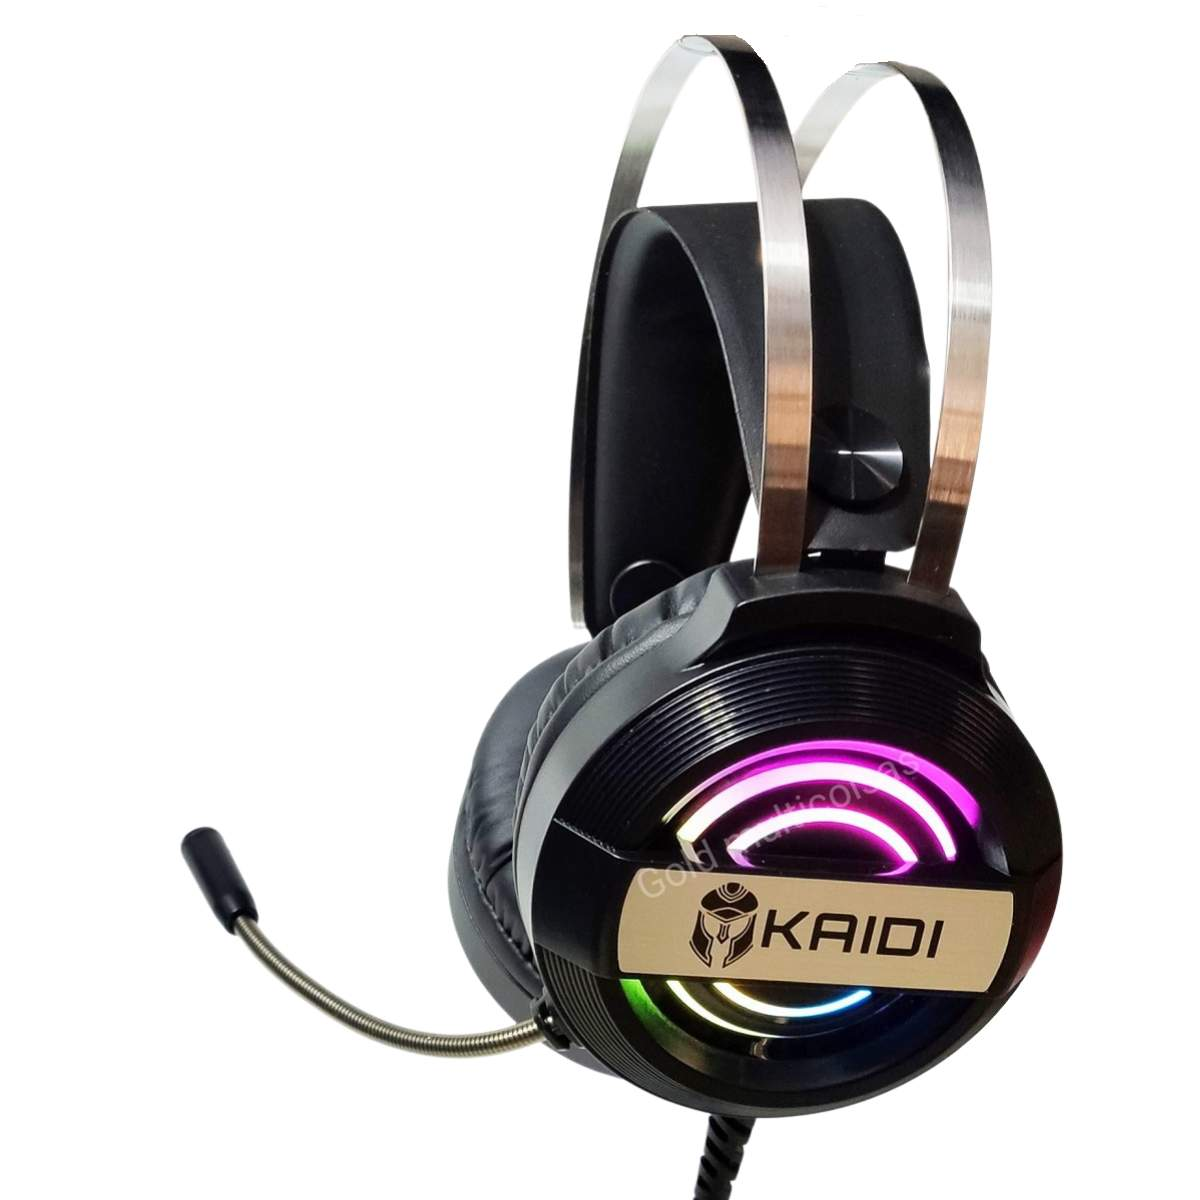 HEADSET GAMER RGB KAIDI KD-767 P2 USB